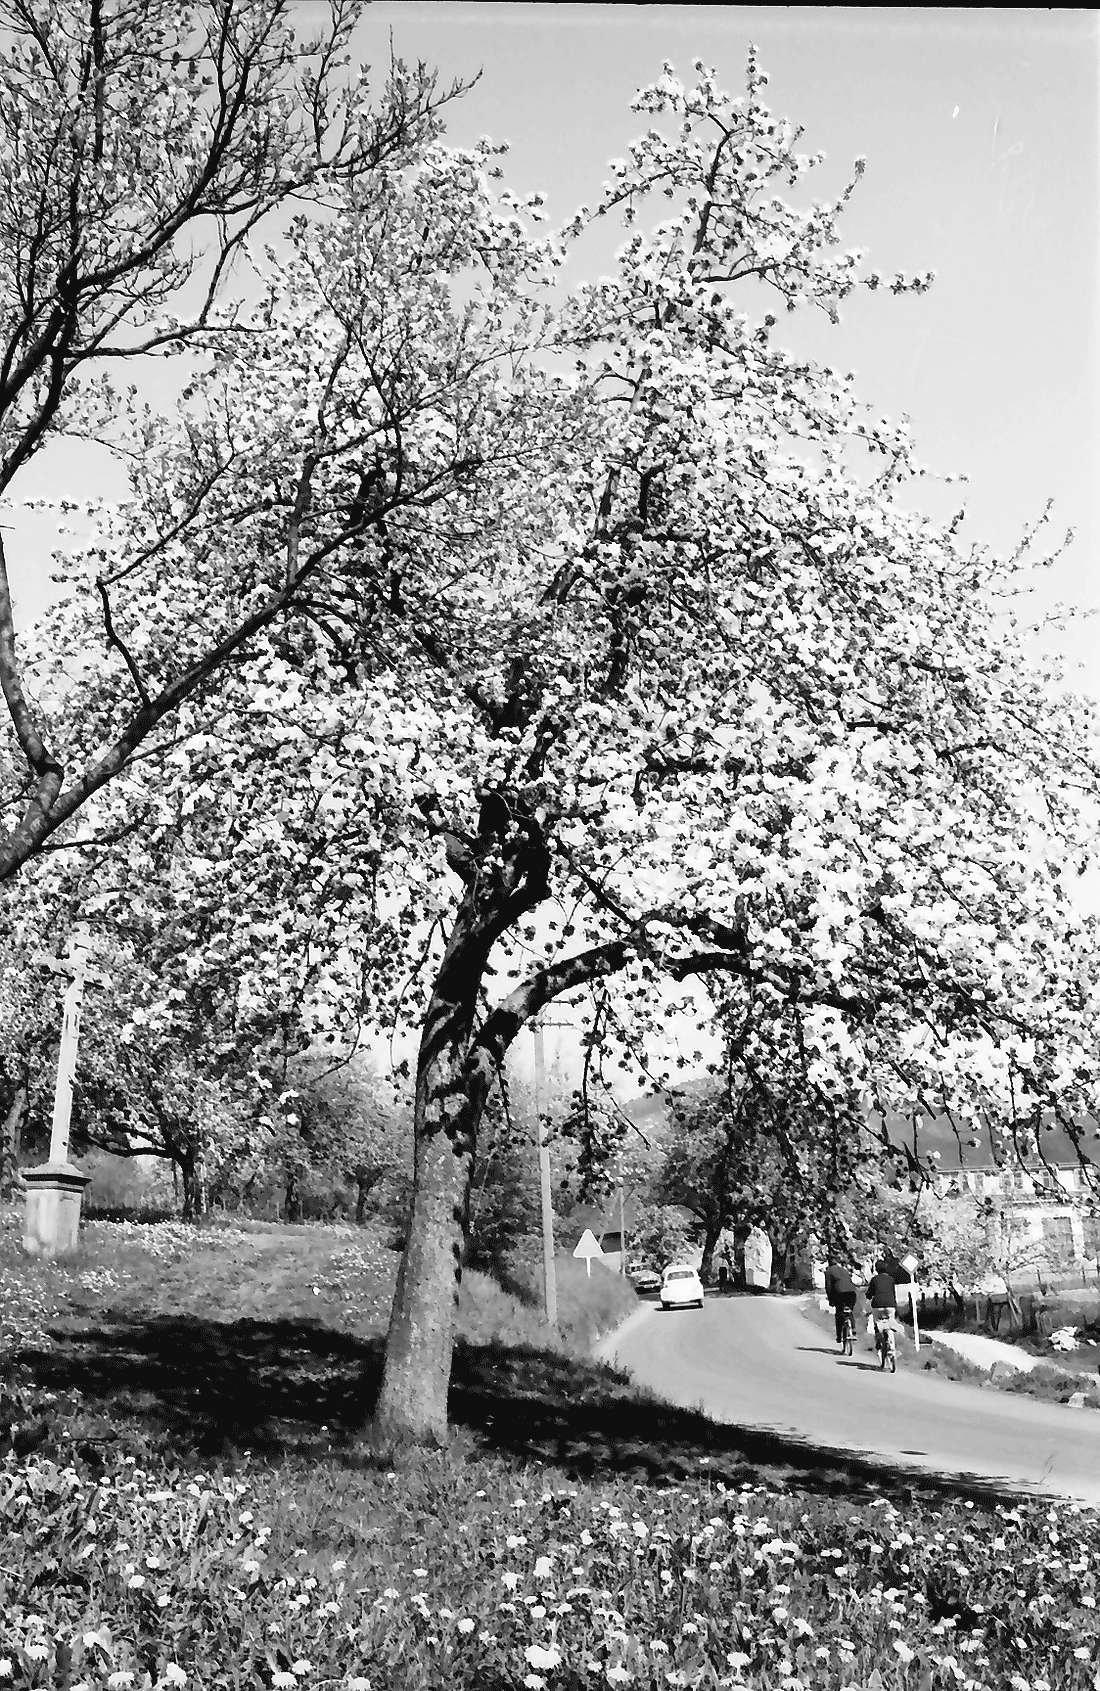 Bollschweil: Blütenbäume an der Straße, Bild 2